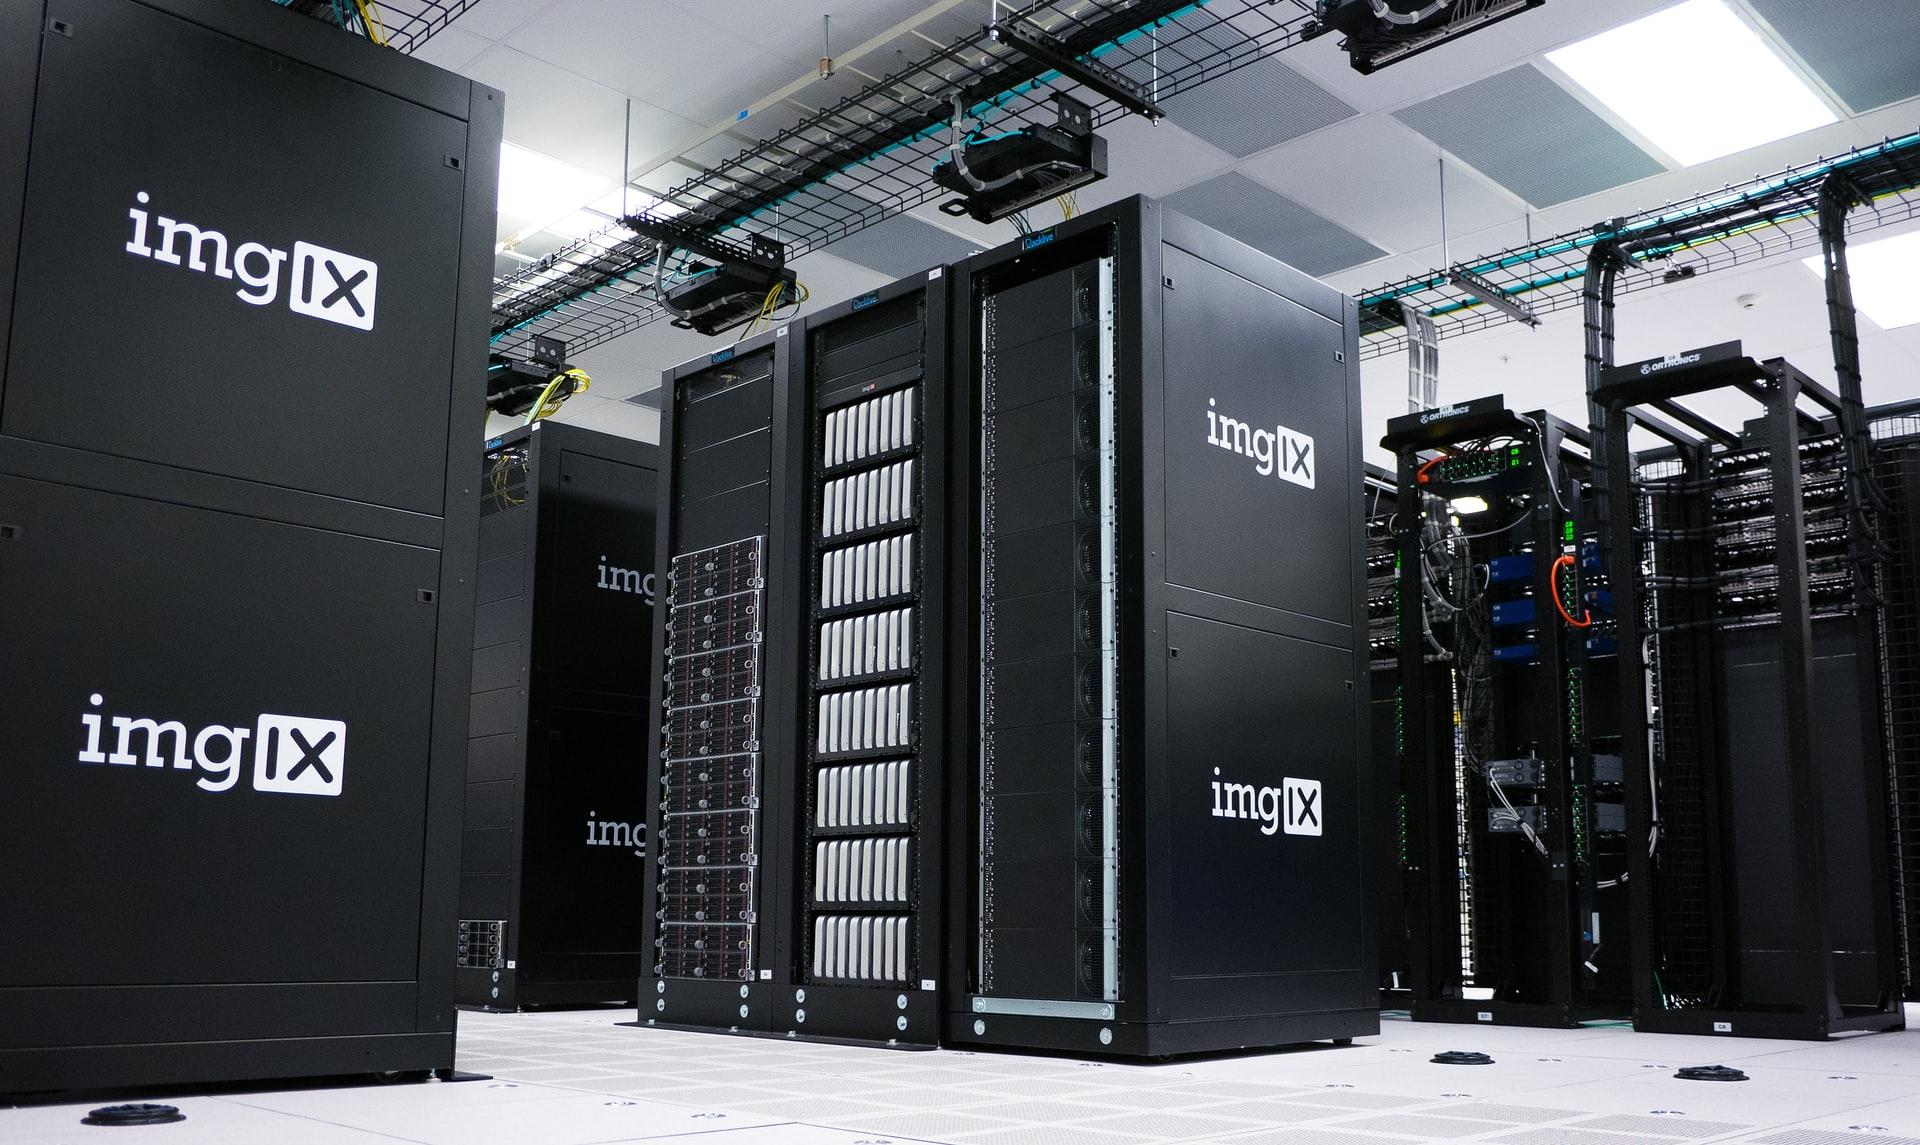 Imgix server room